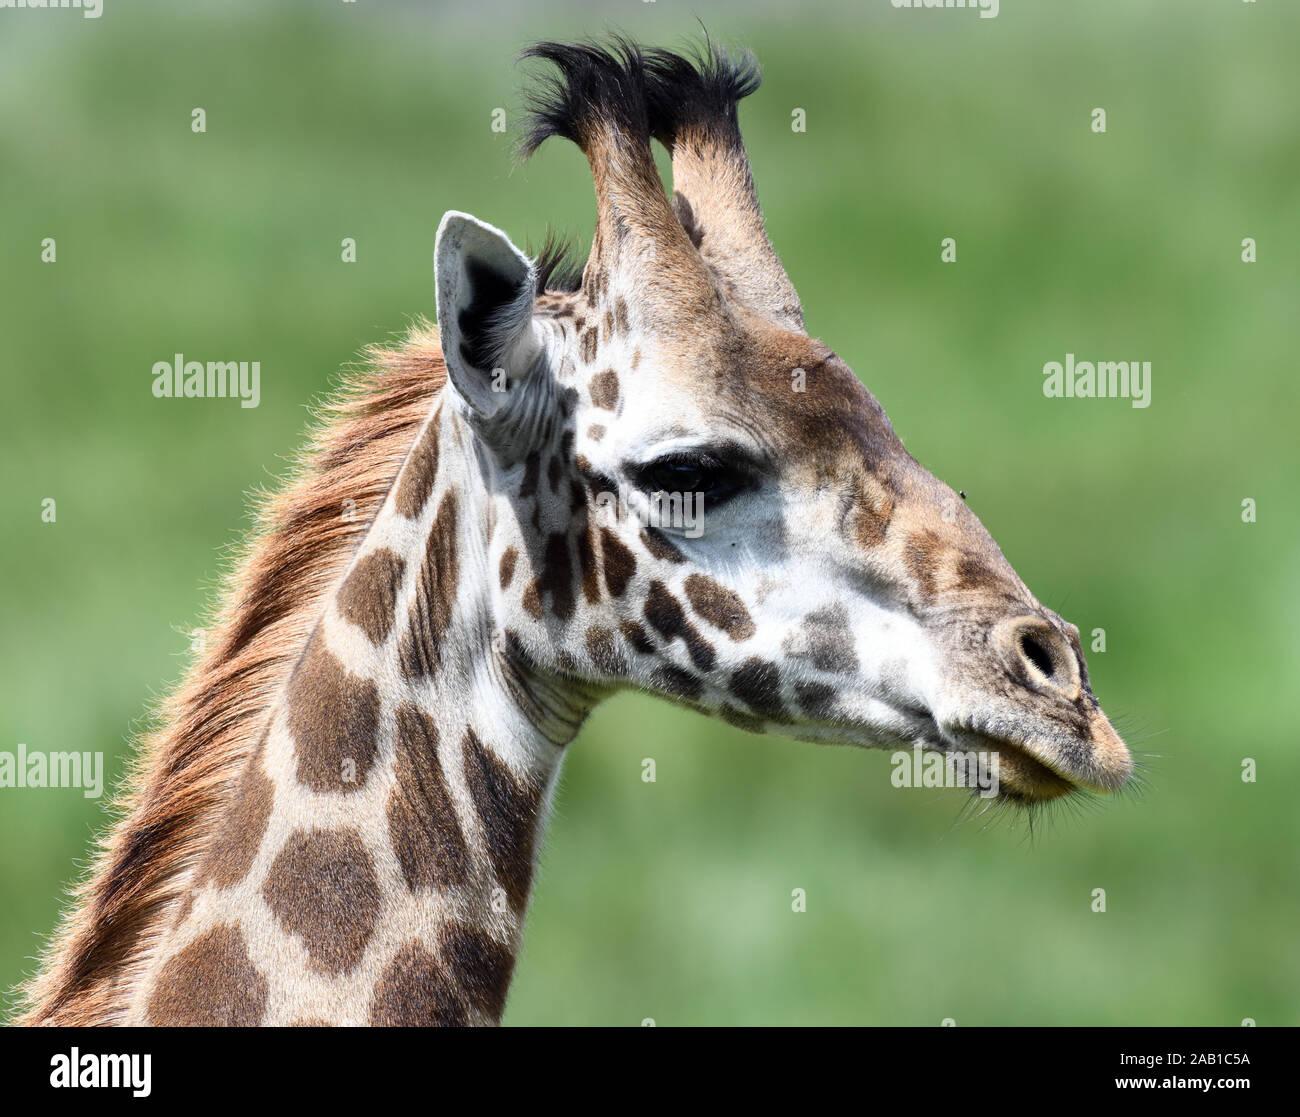 Female Masai giraffe (Giraffa camelopardalis tippelskirchii). Arusha National Park. Arusha, Tanzania. Stock Photo